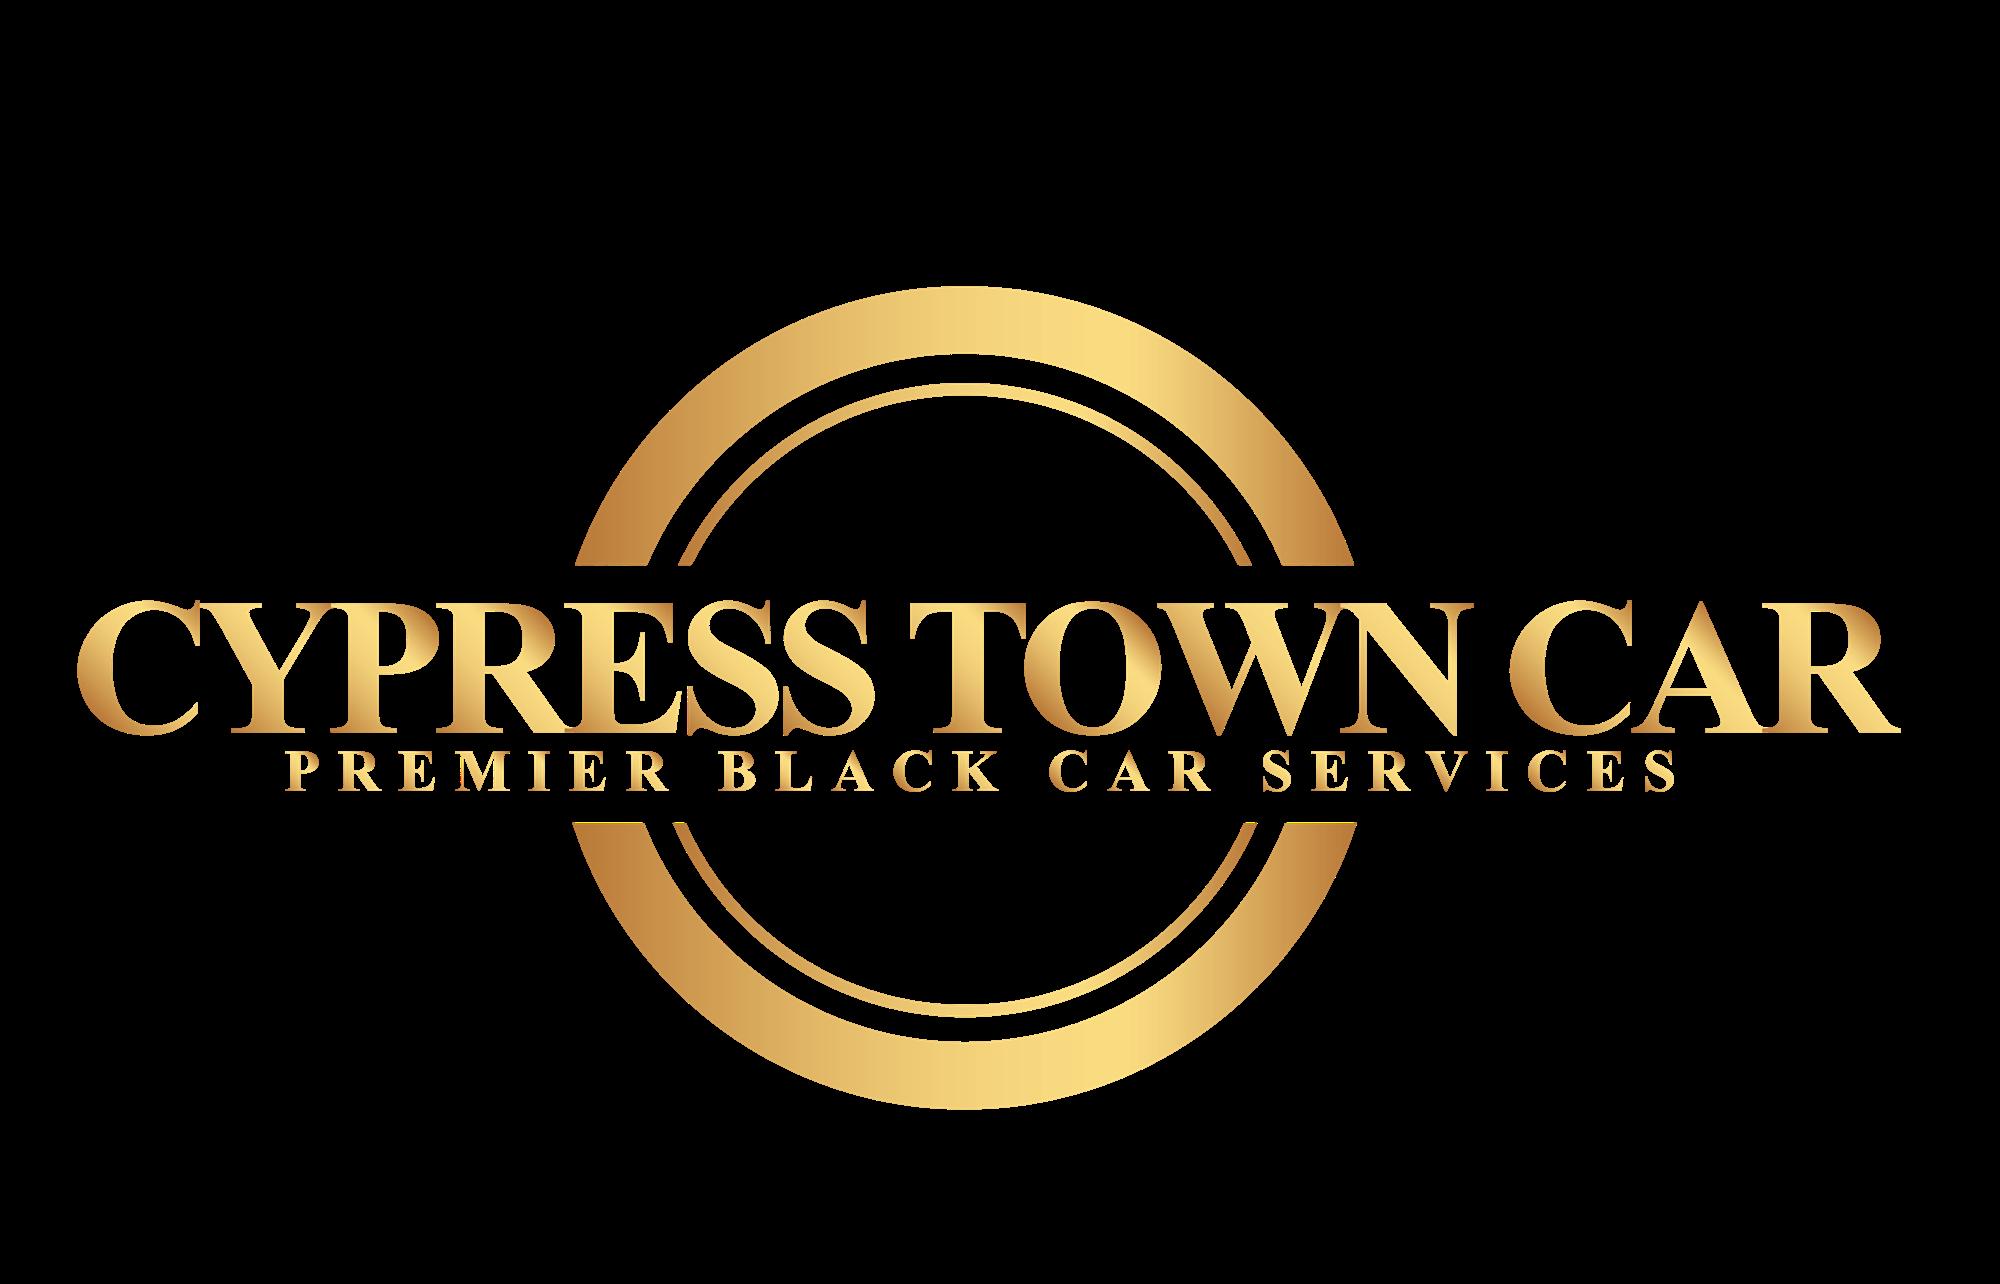 Cypress Town Car